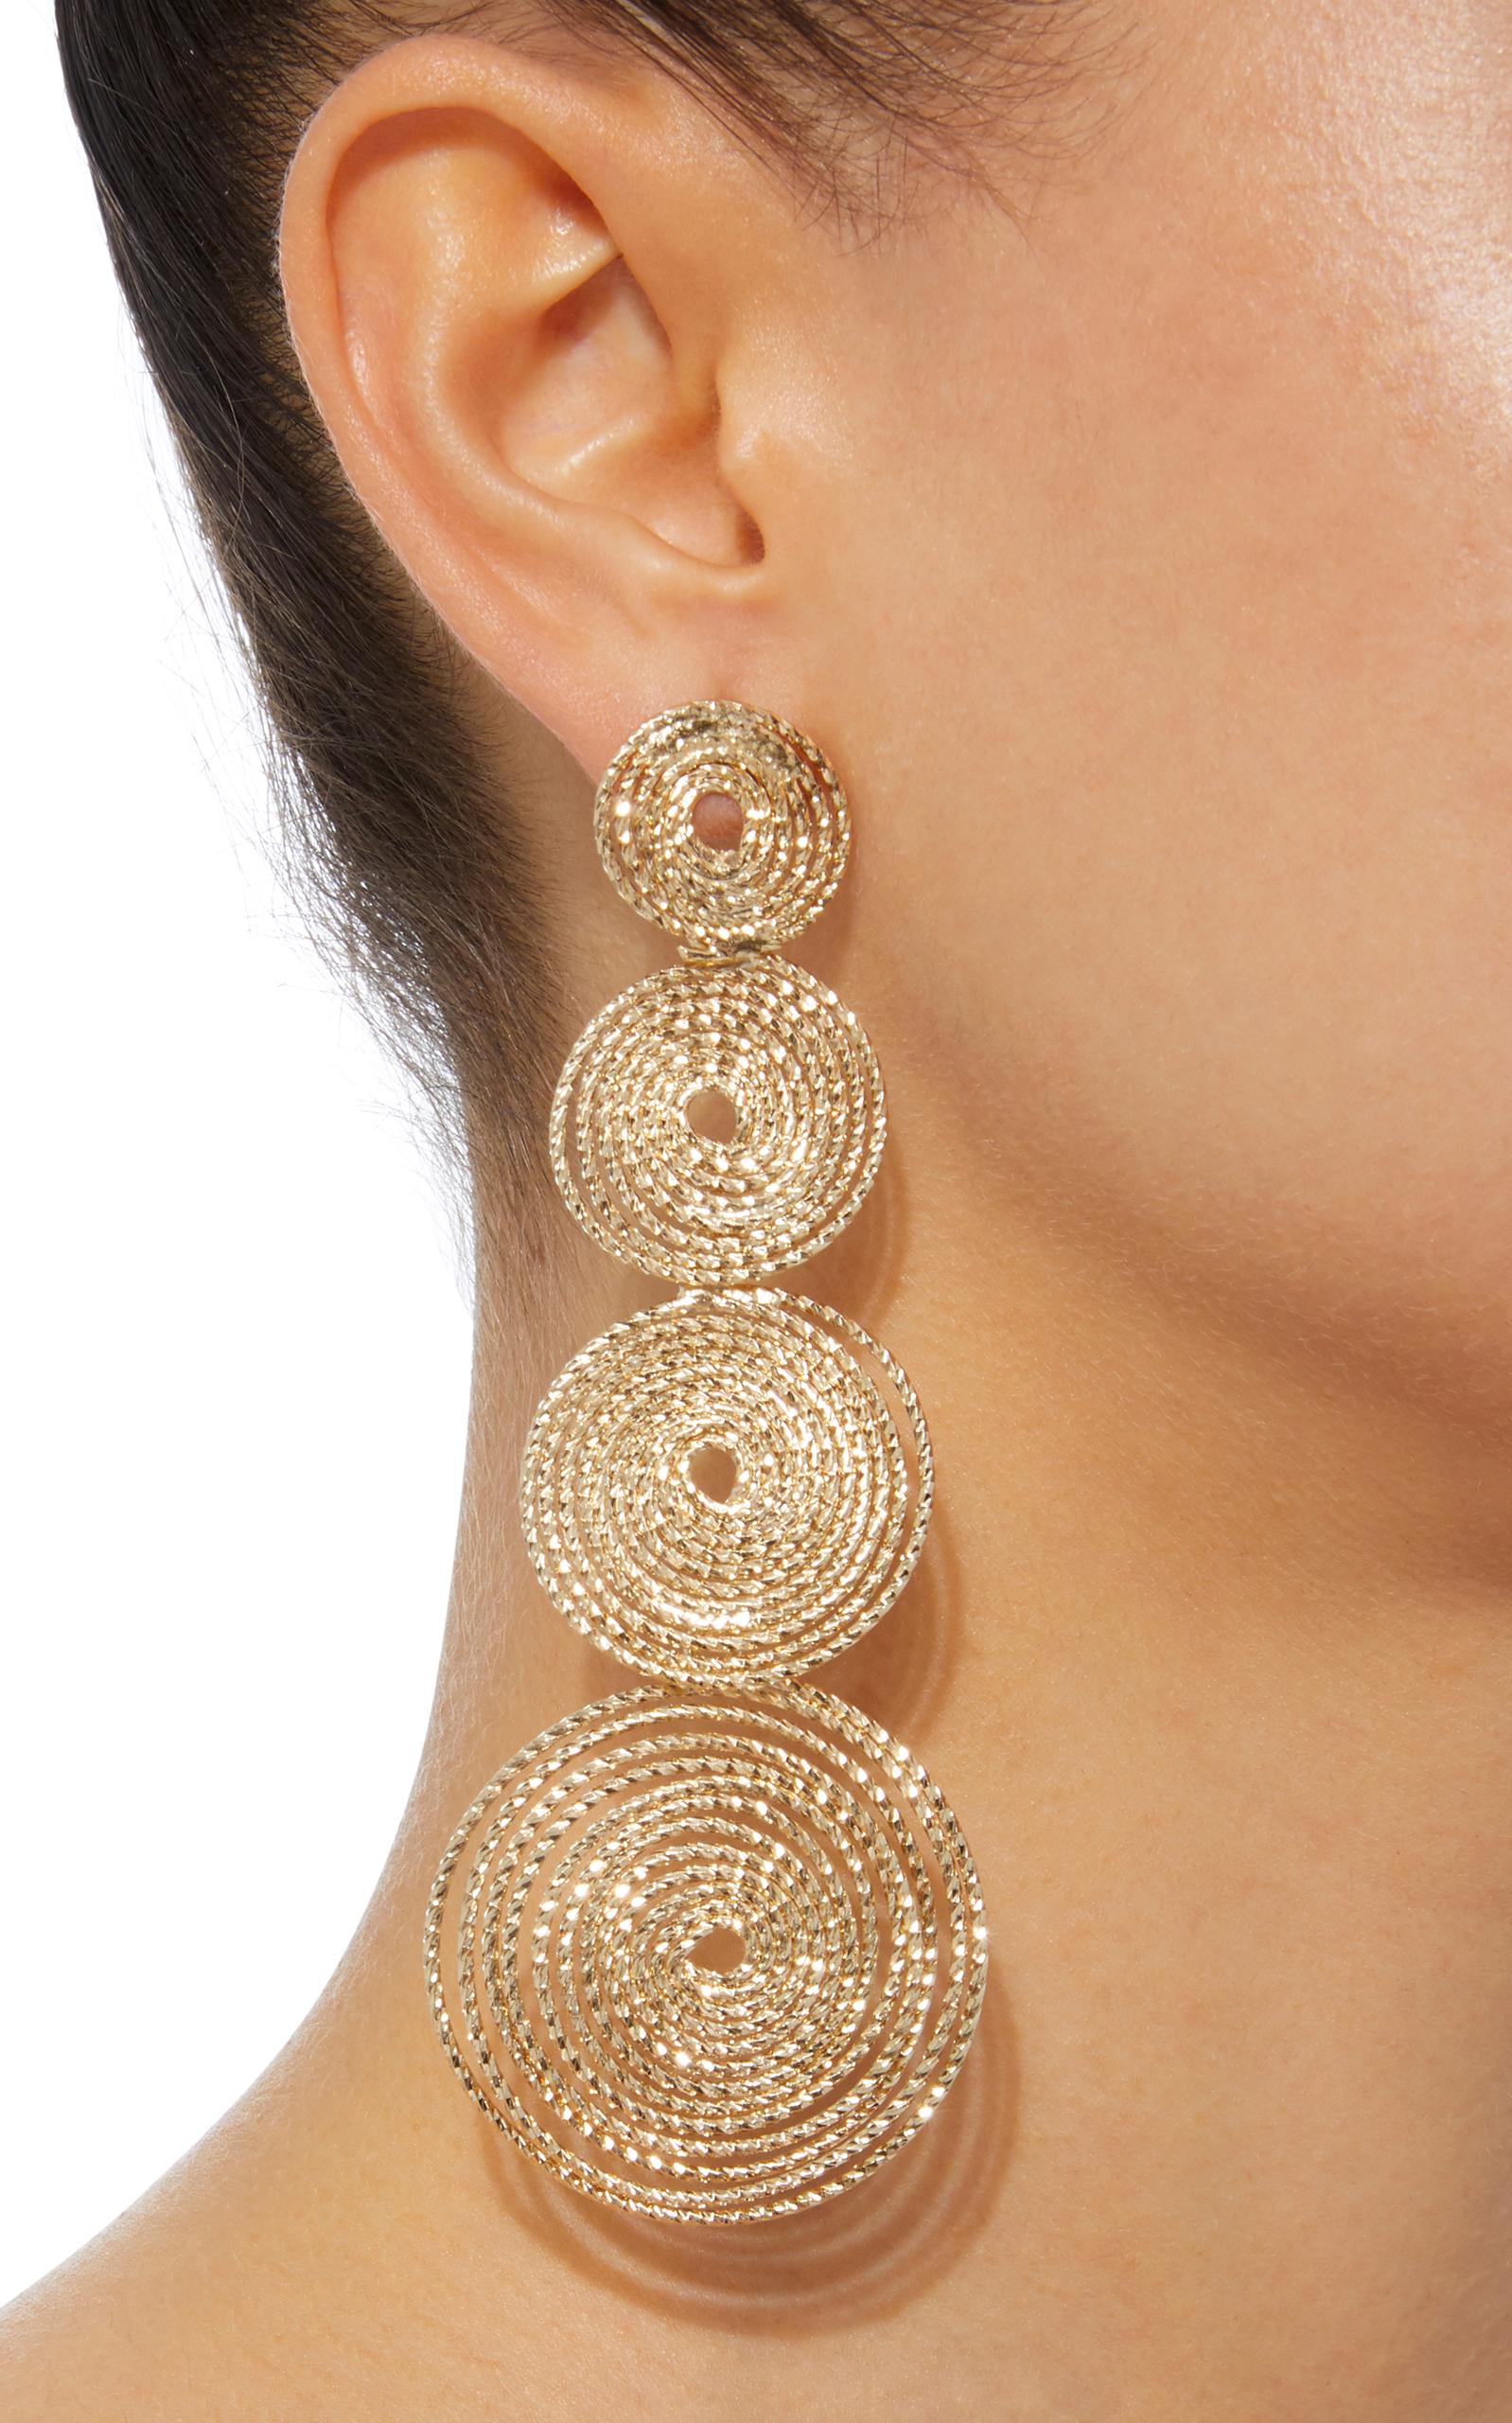 Soffio Gold-Tone Earrings by Rosantica  aa675fa510